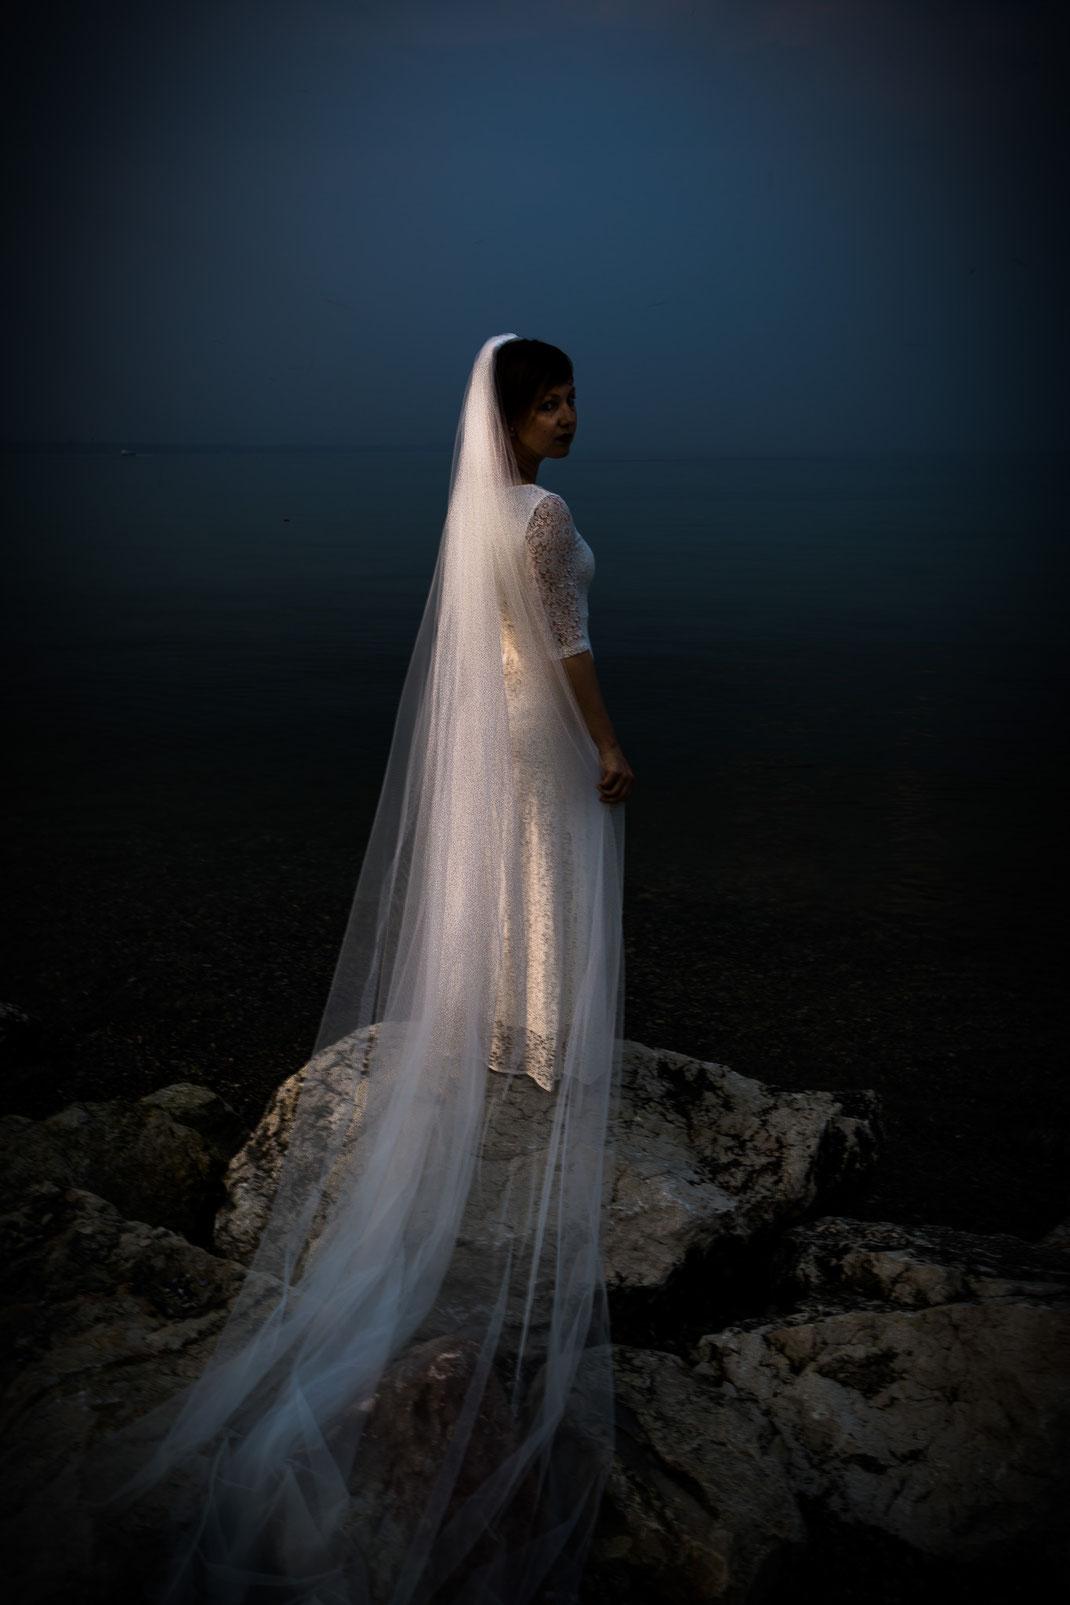 ROVA FineArt Wedding Photography - conceptual wedding photography - Forchheim - Franconia